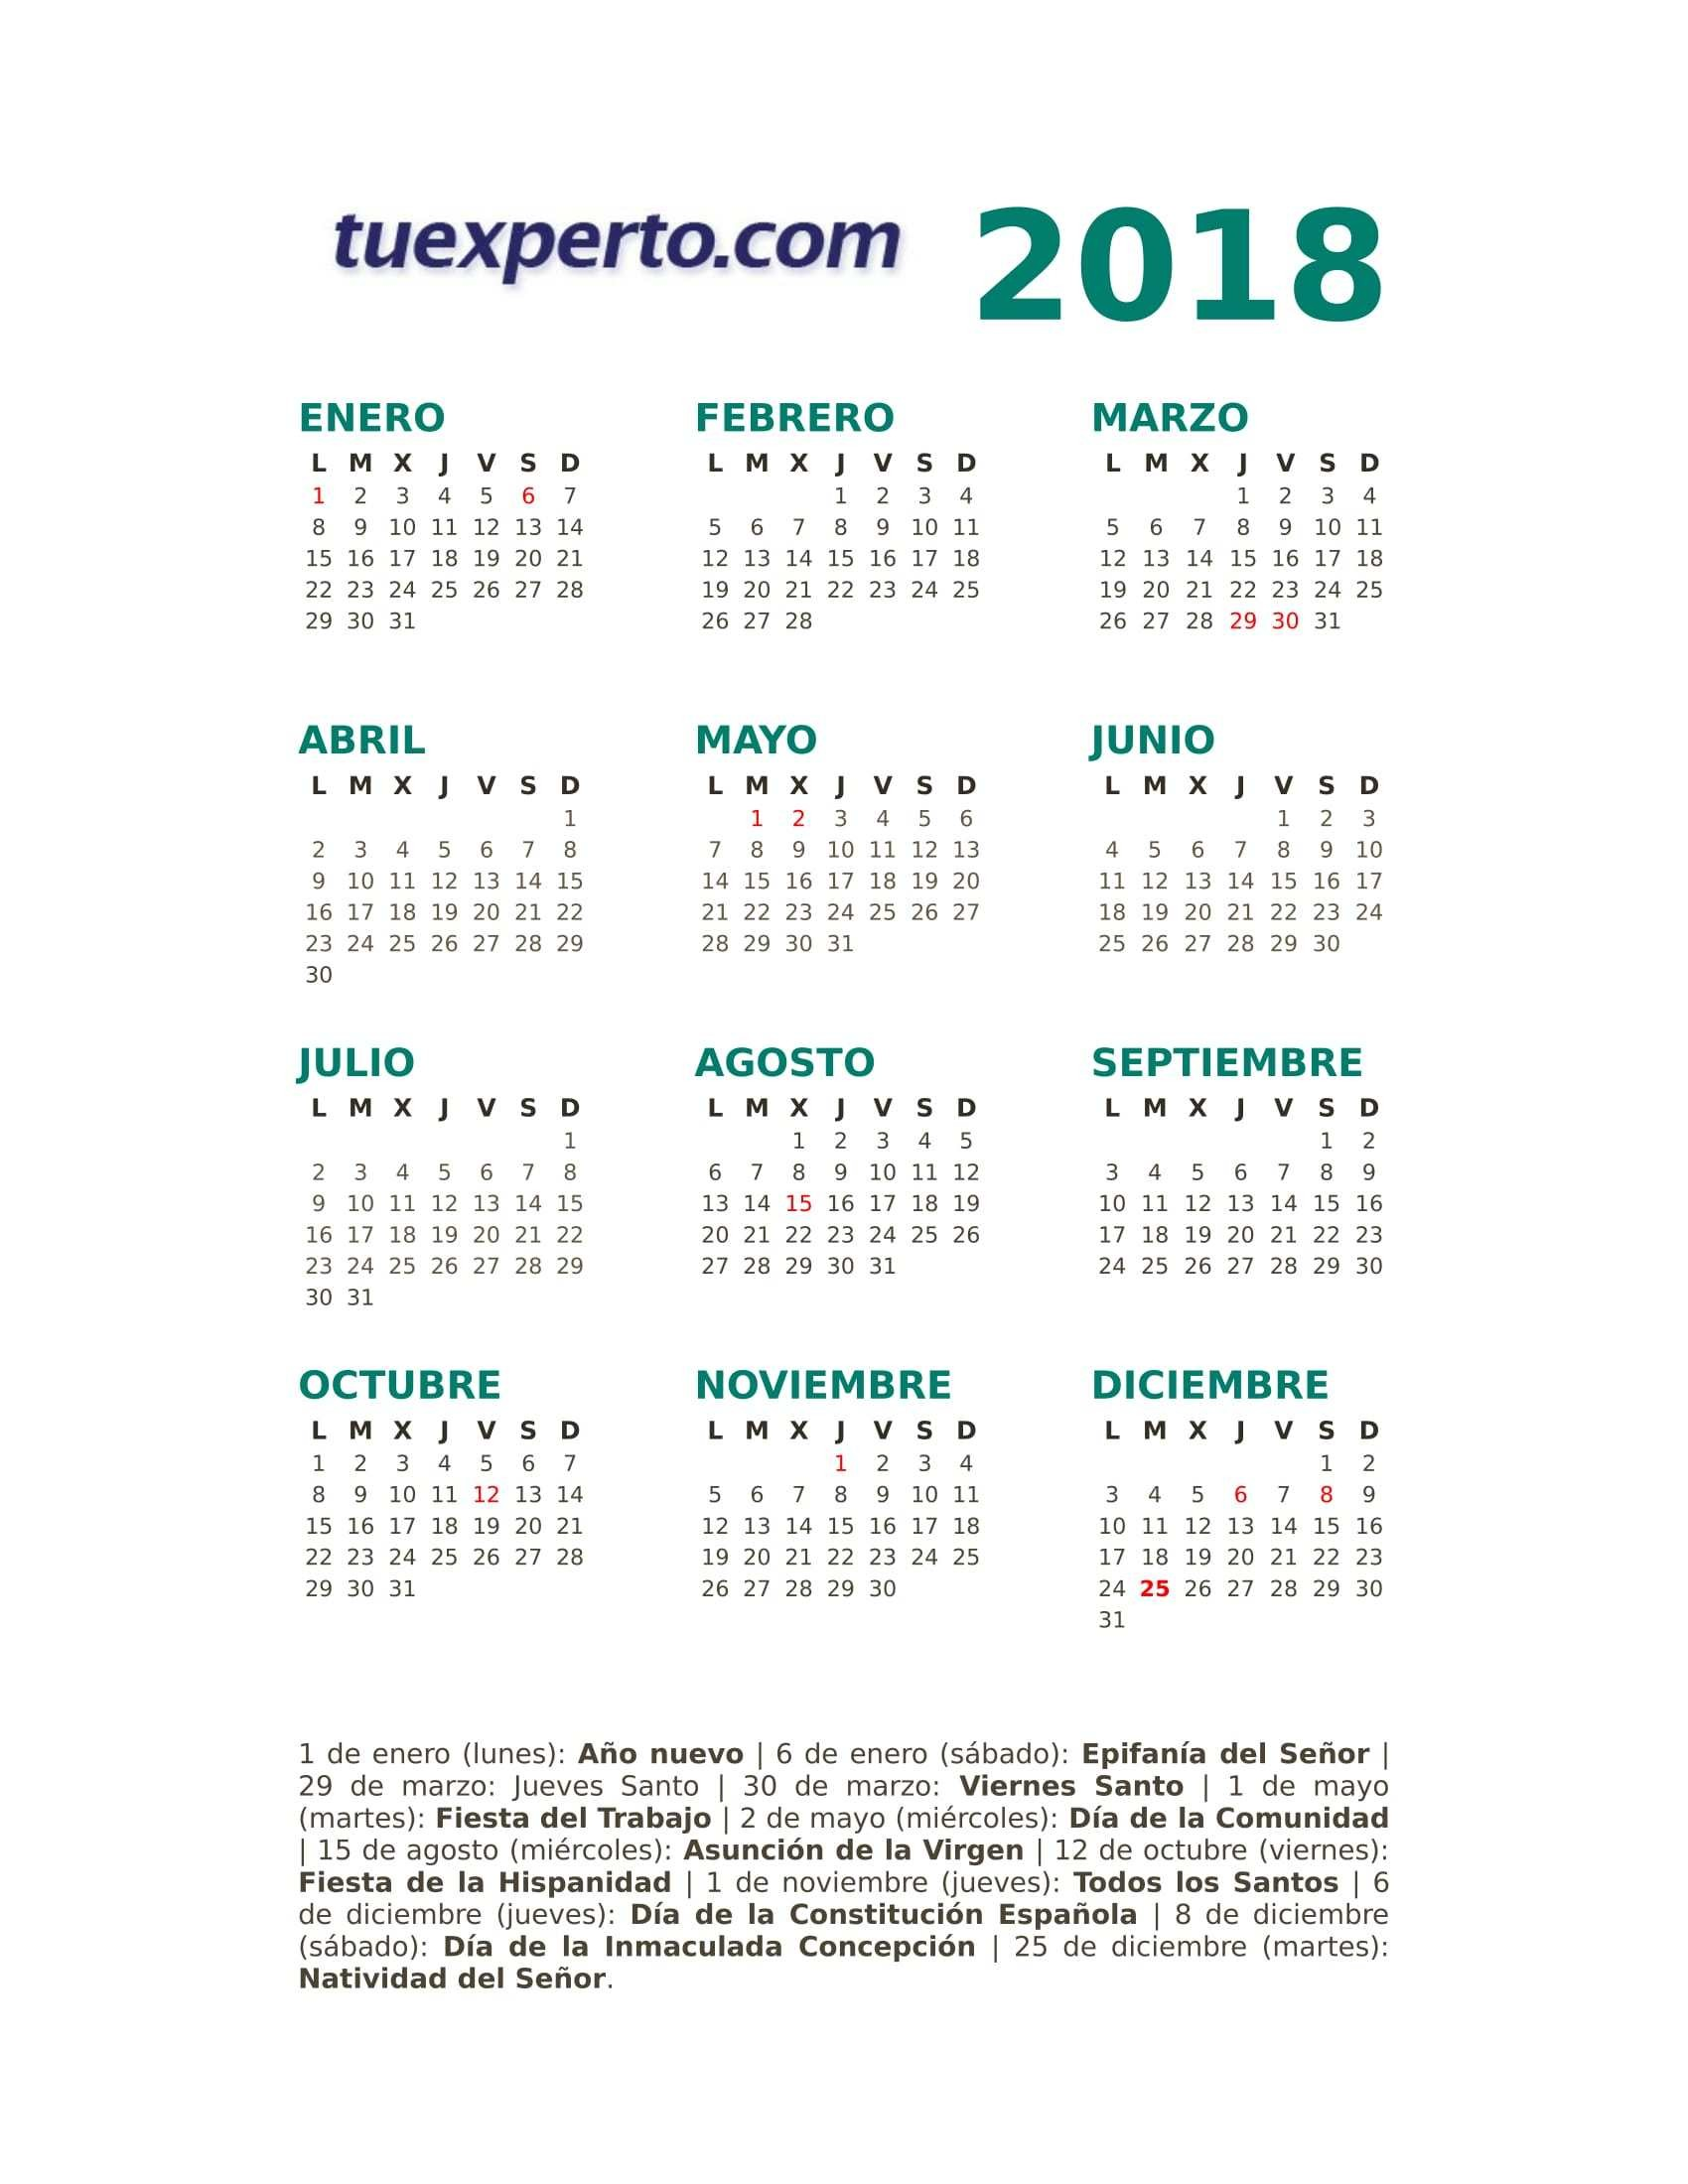 Calendario Lunar Enero 2019 Chile Más Recientes Calendario Noviembre 2018 Para Imprimir Ukrandiffusion Of Calendario Lunar Enero 2019 Chile Más Actual Pin De Calendario Hispano En Calendario Con Feriados A±o 2020